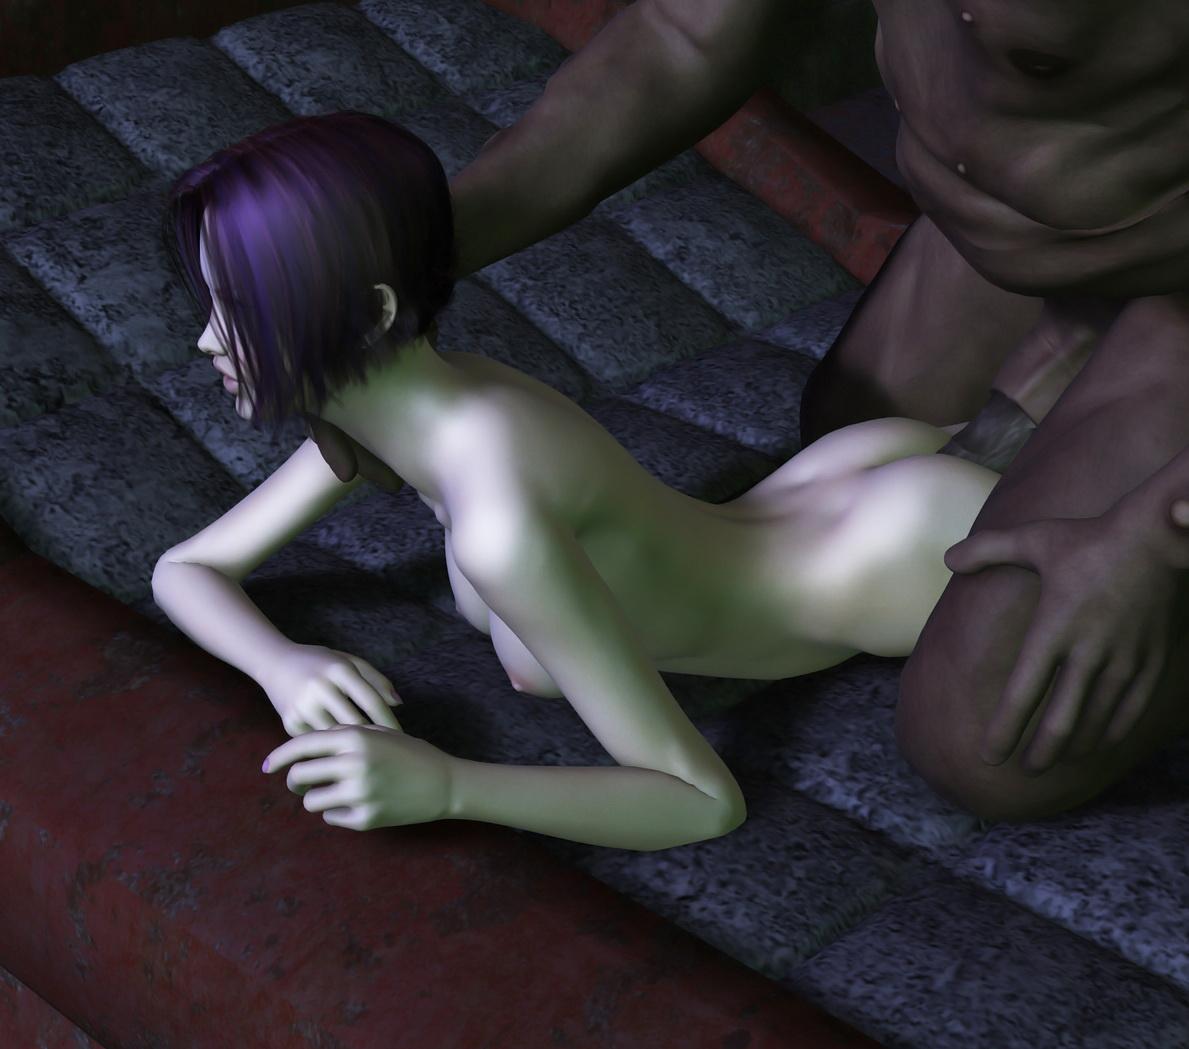 Секс монстр ххх 16 фотография